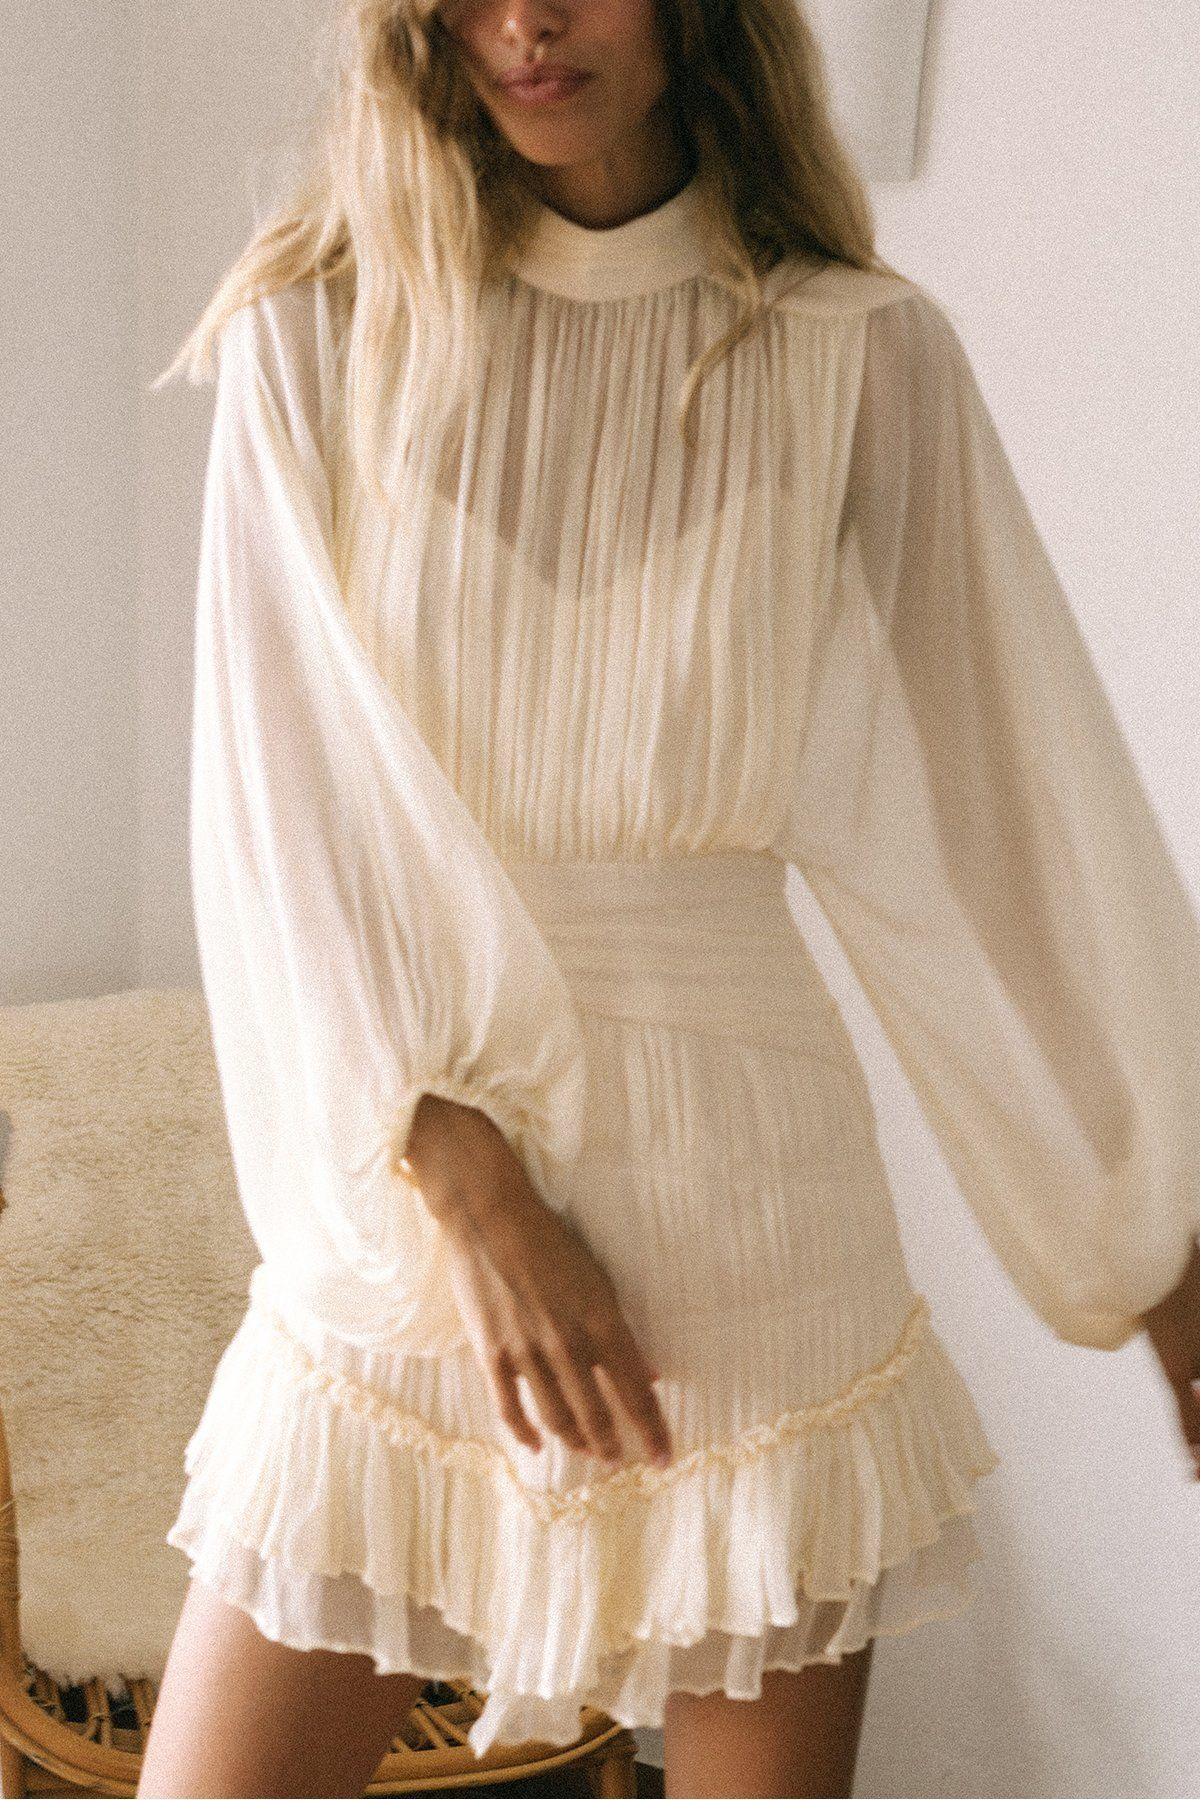 Victoria Long Sleeve Ruched Mini Dress Cream Long Sleeve Casual Dress Cute Long Sleeve Dresses Mini Dress [ 1800 x 1200 Pixel ]